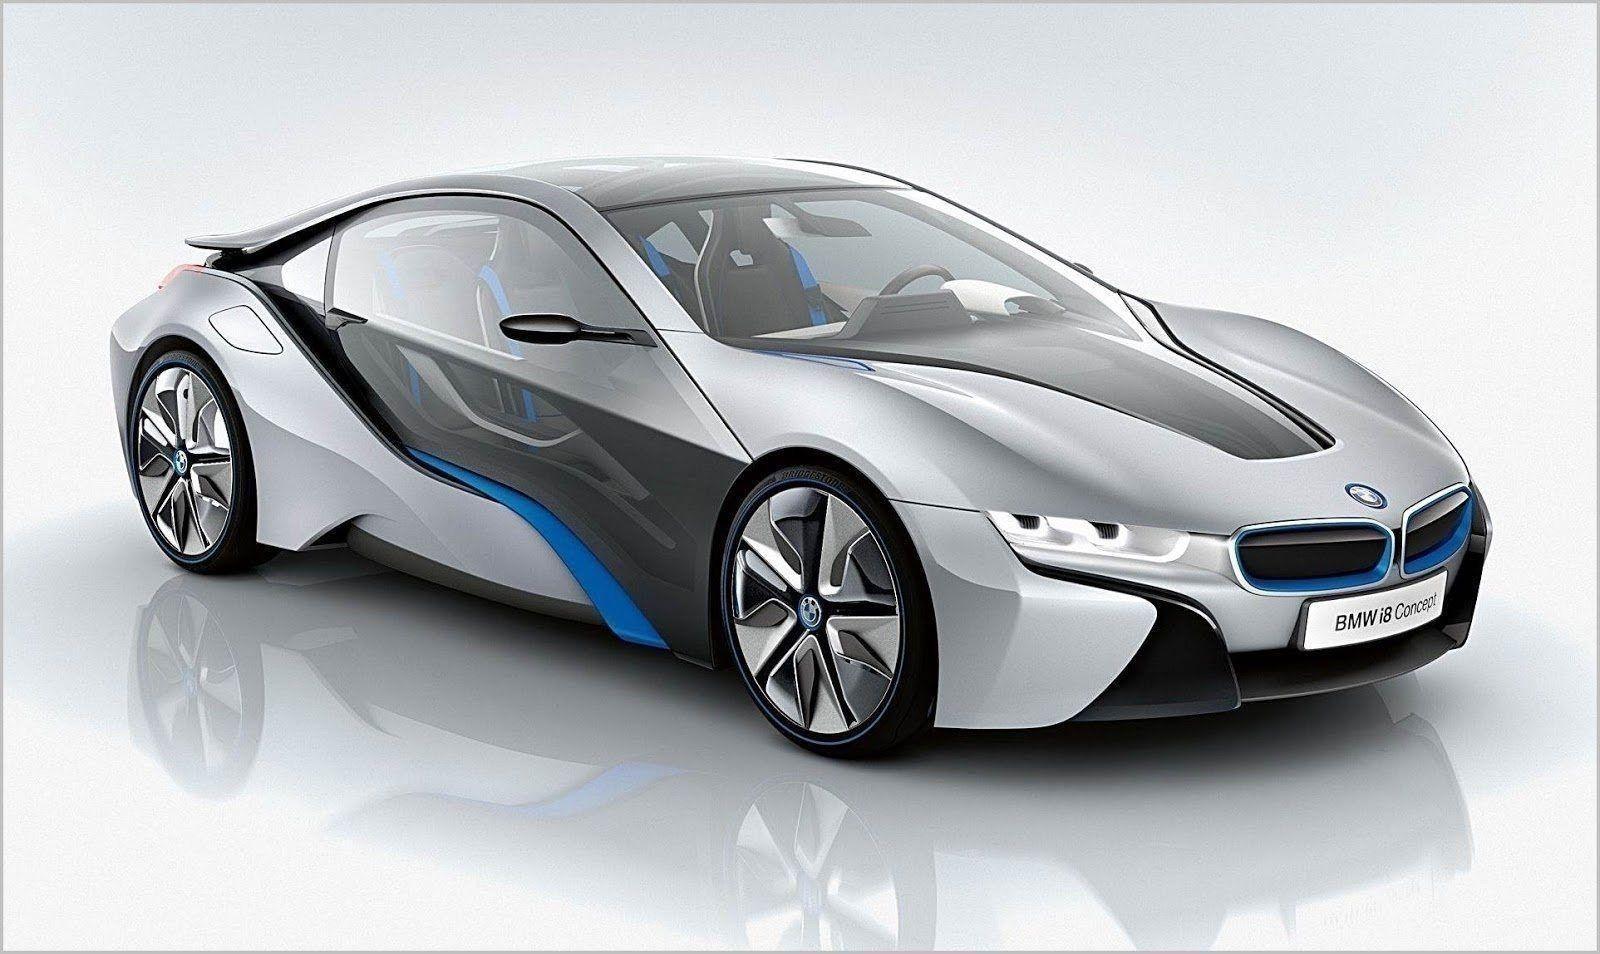 New 2019 Bmw I9 Release Car Price 2019 Koncept Bmw Konceptualnye Mashiny Superkary